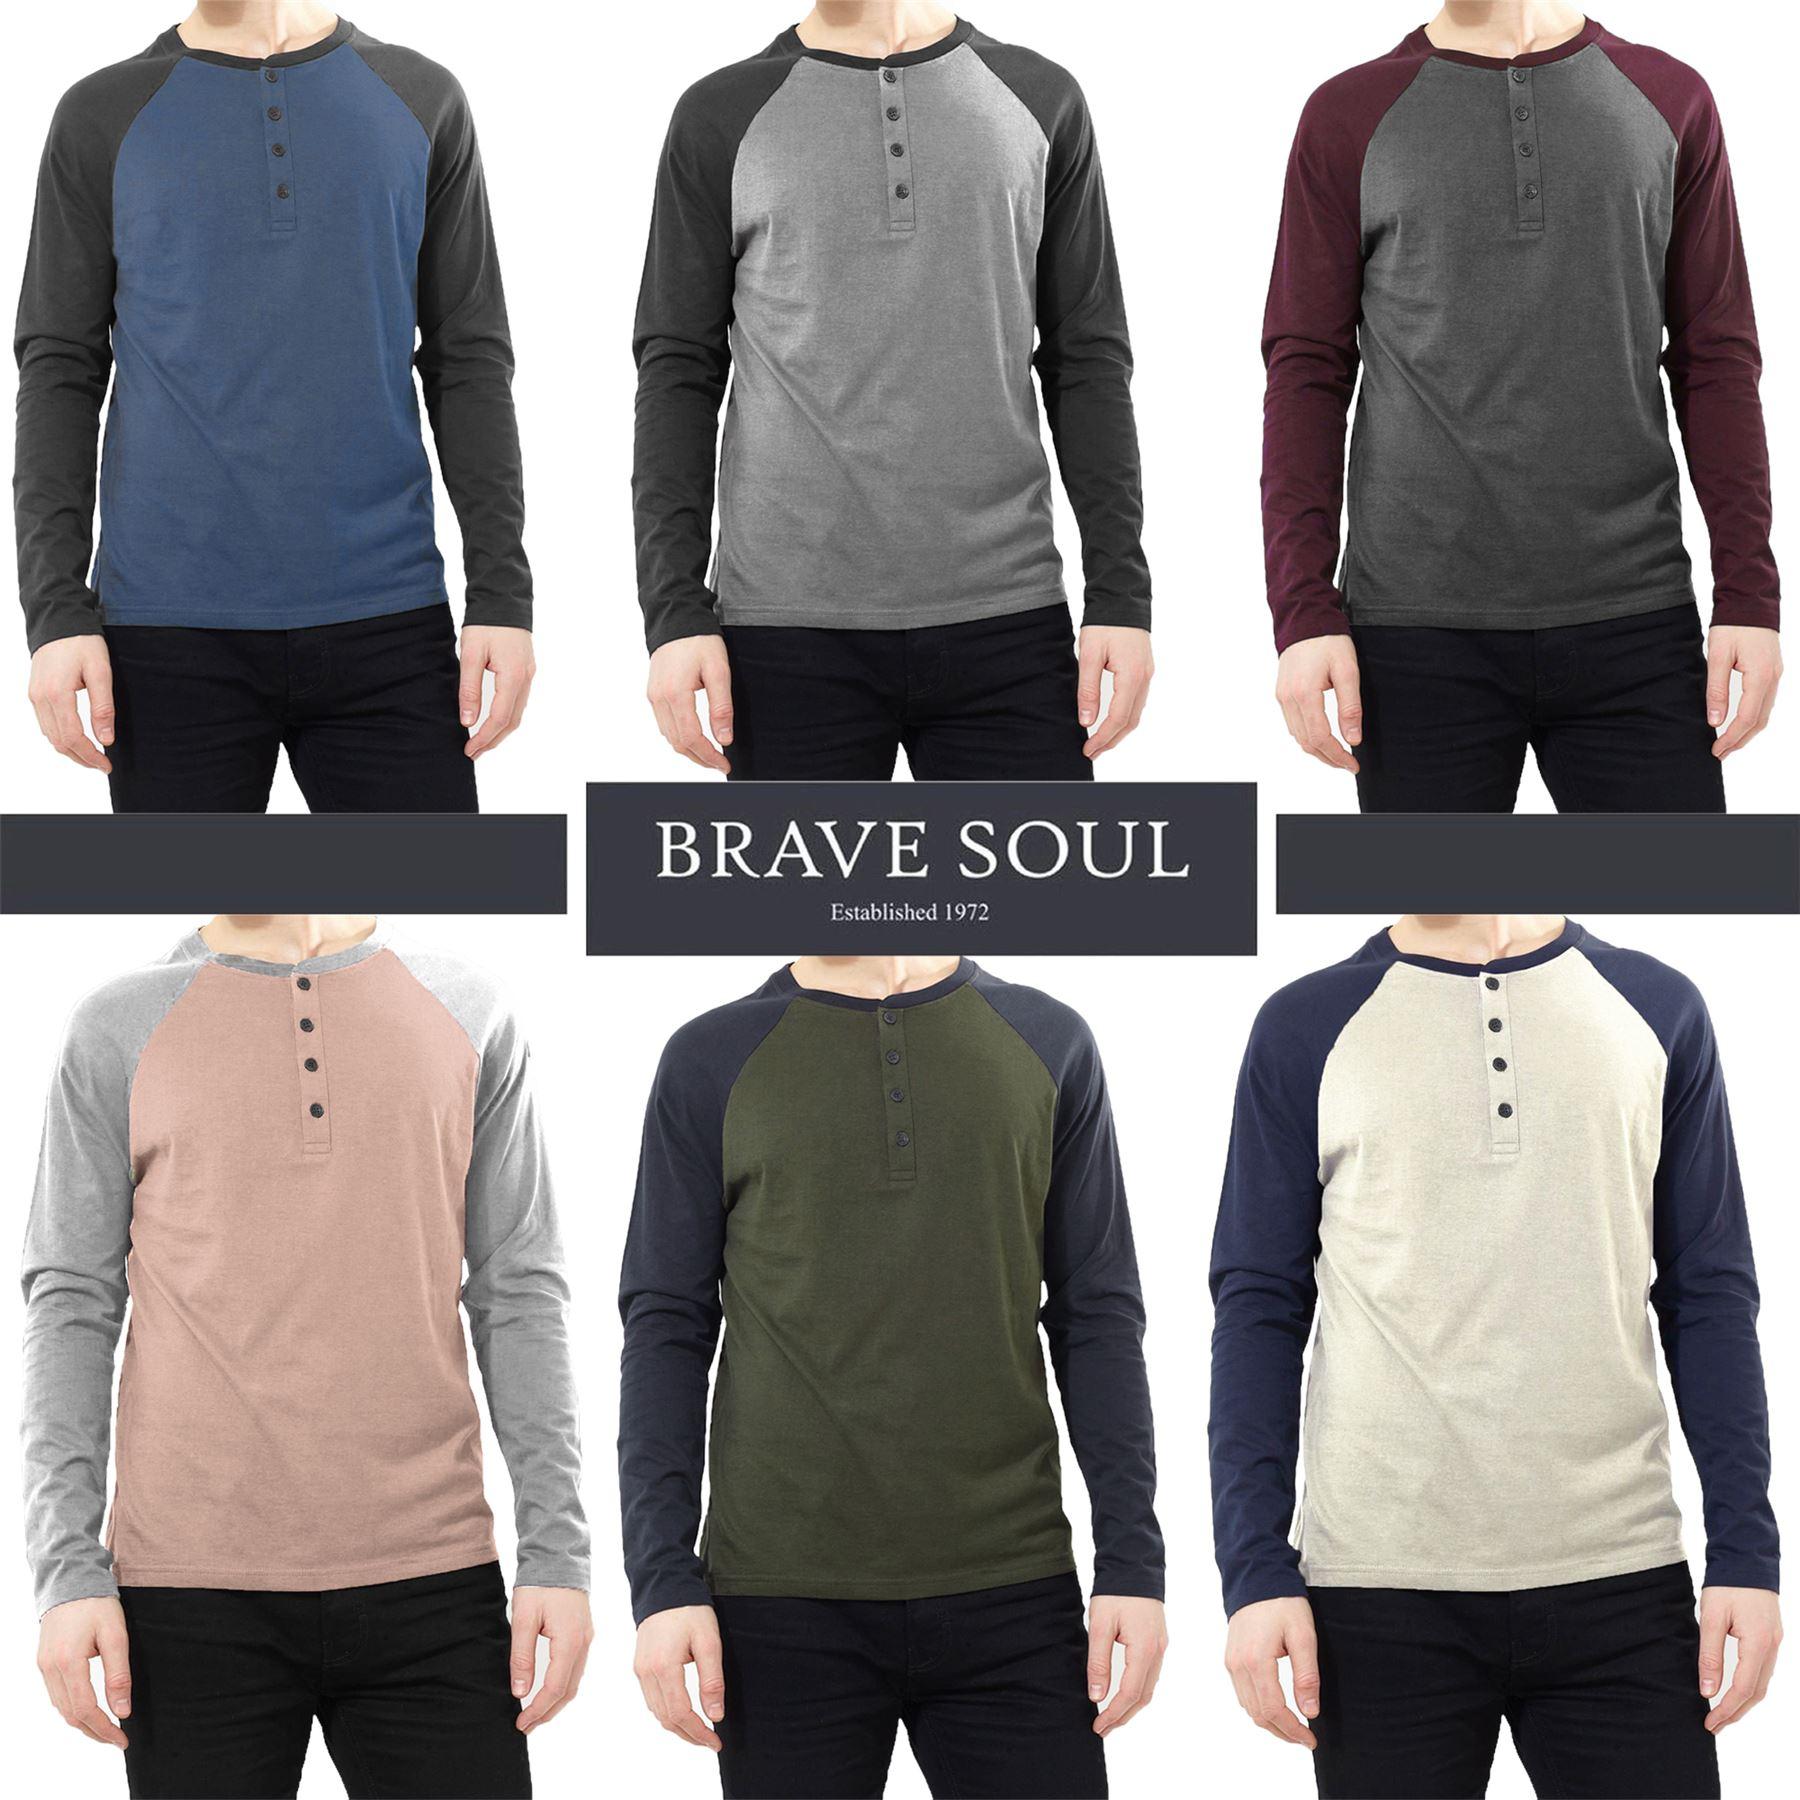 0209f7b2eaf Details about Mens Brave Soul Long Sleeve Buttoned Crew Neck Raglan  Baseball Style T-Shirt Top